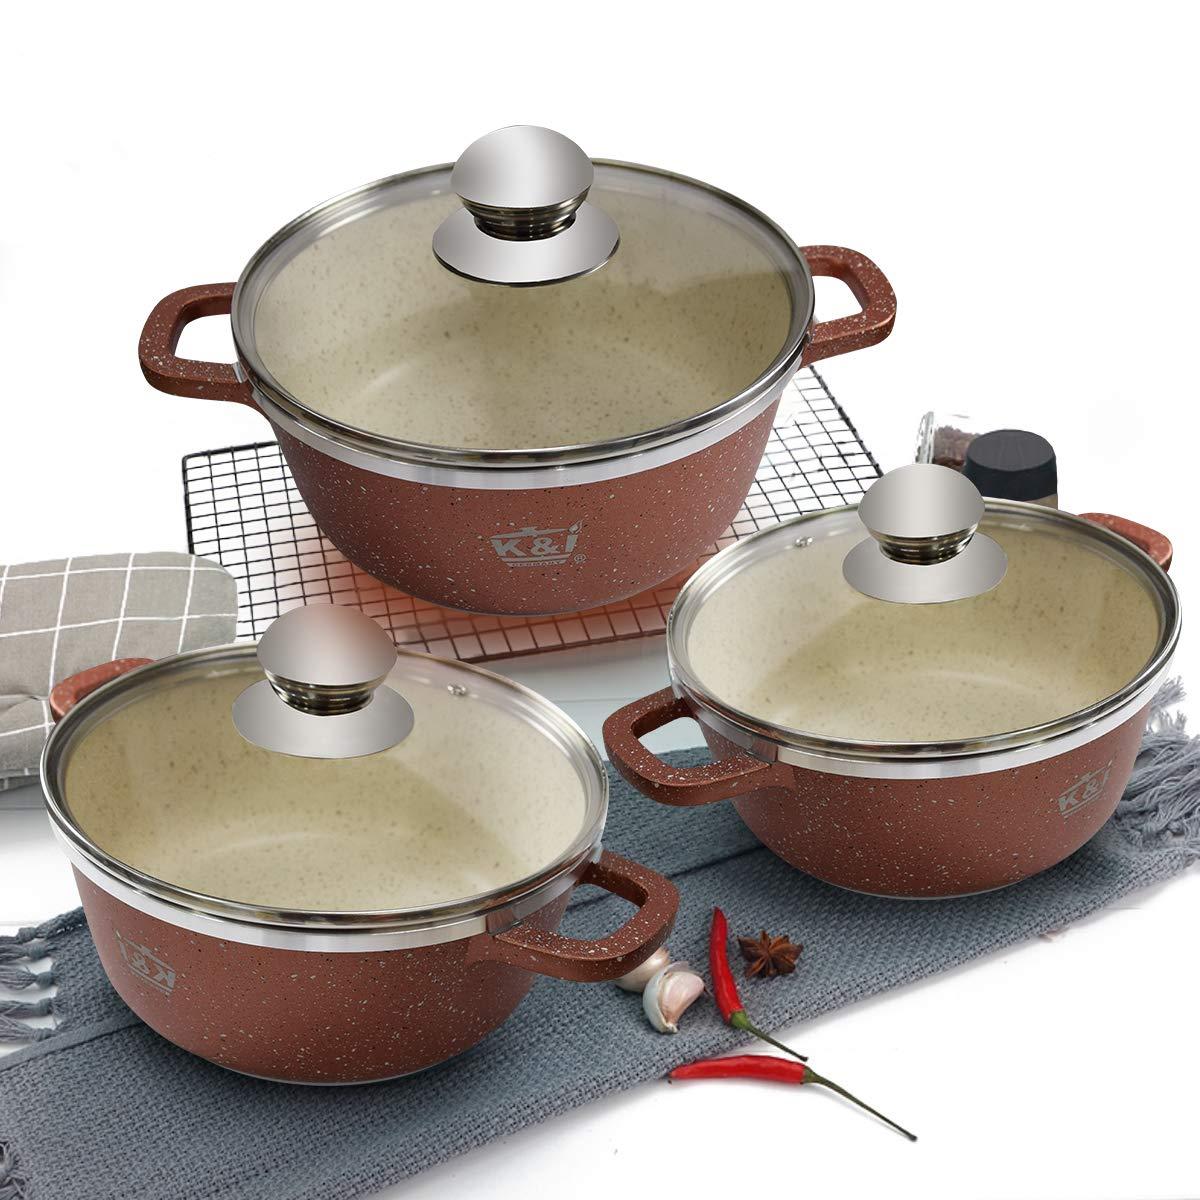 KI 6pcs Ceramic Nonstick Cookware Set Casserole Set Aluminum Pots